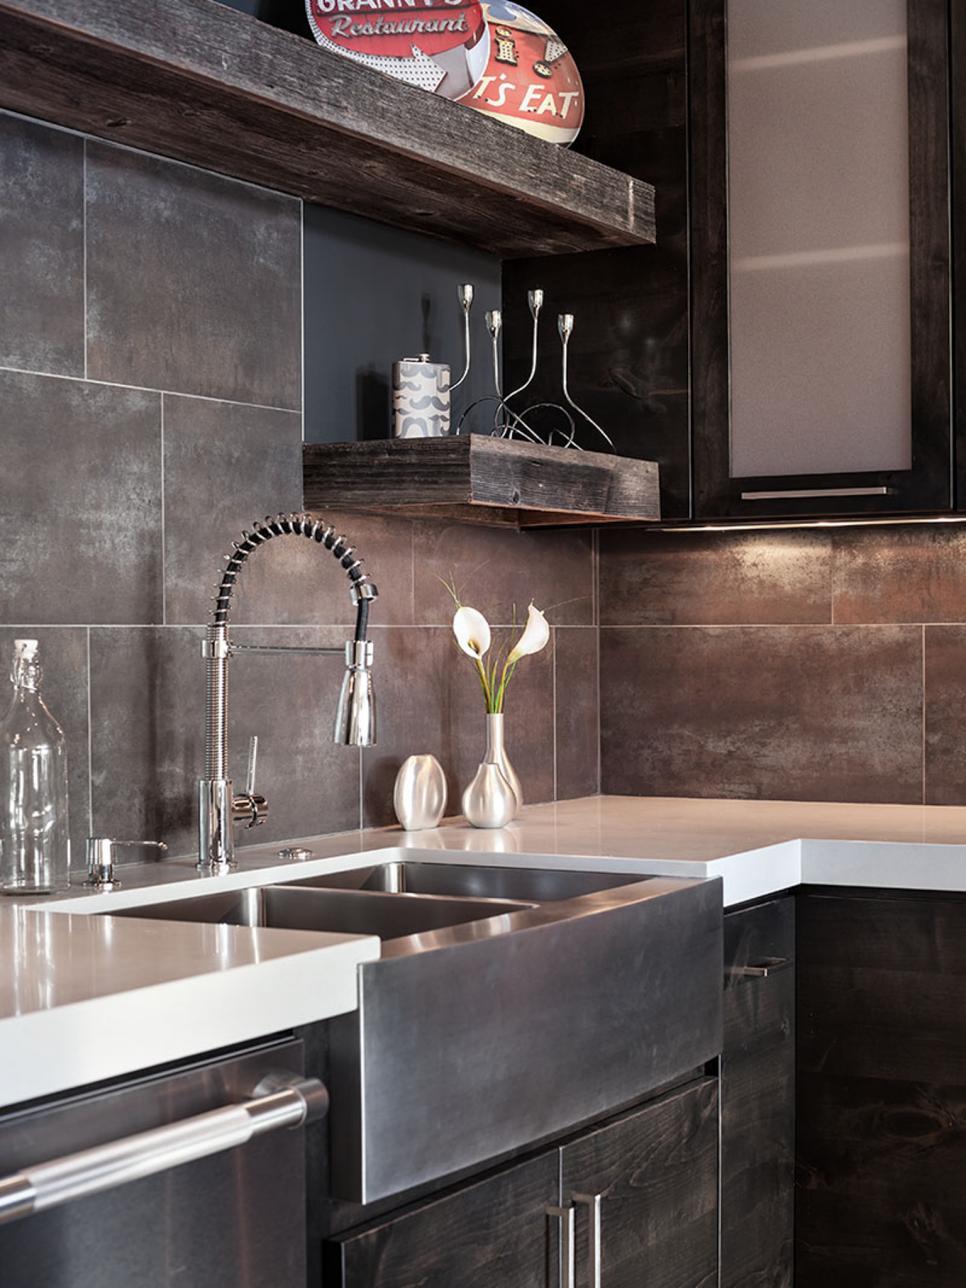 Fantastic Farmhouse Sinks: Apron-Front Sinks in Gorgeous ...